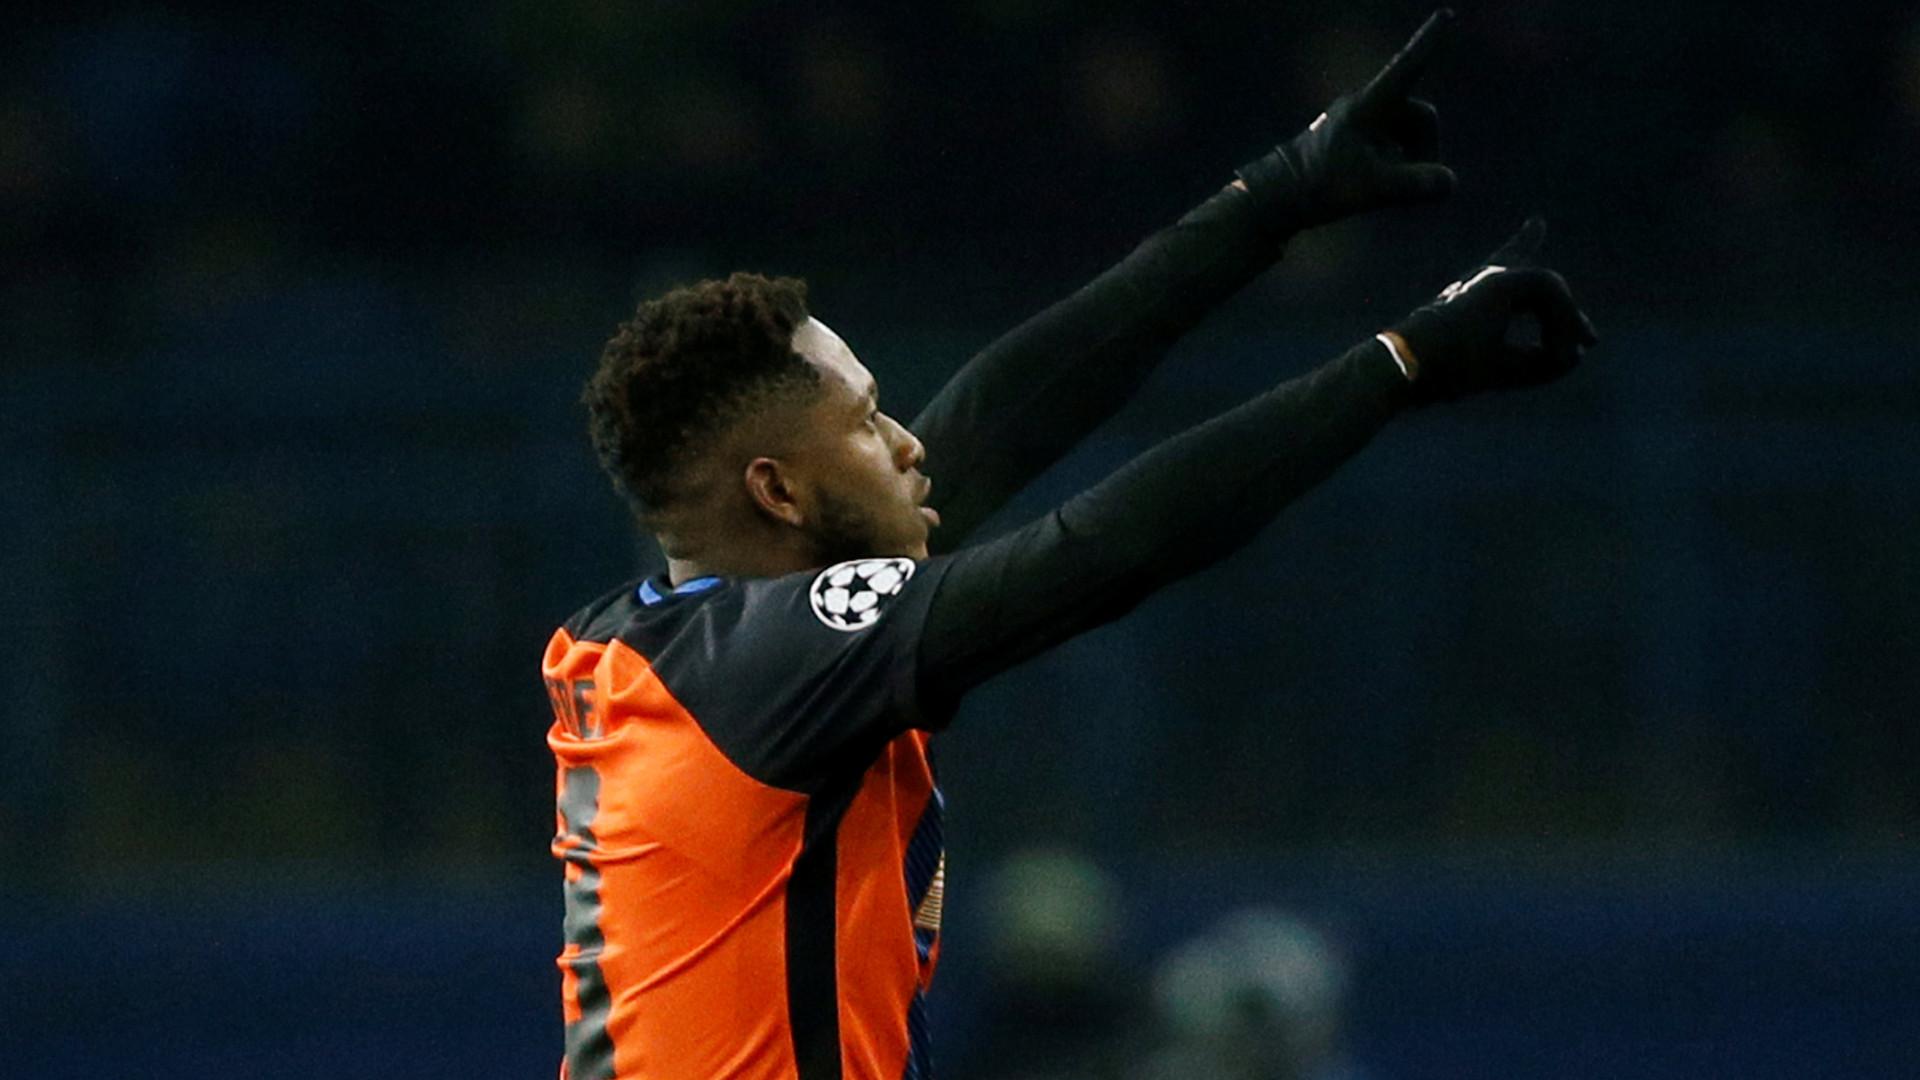 Shakhtar confirma: Fred está de saída para Manchester